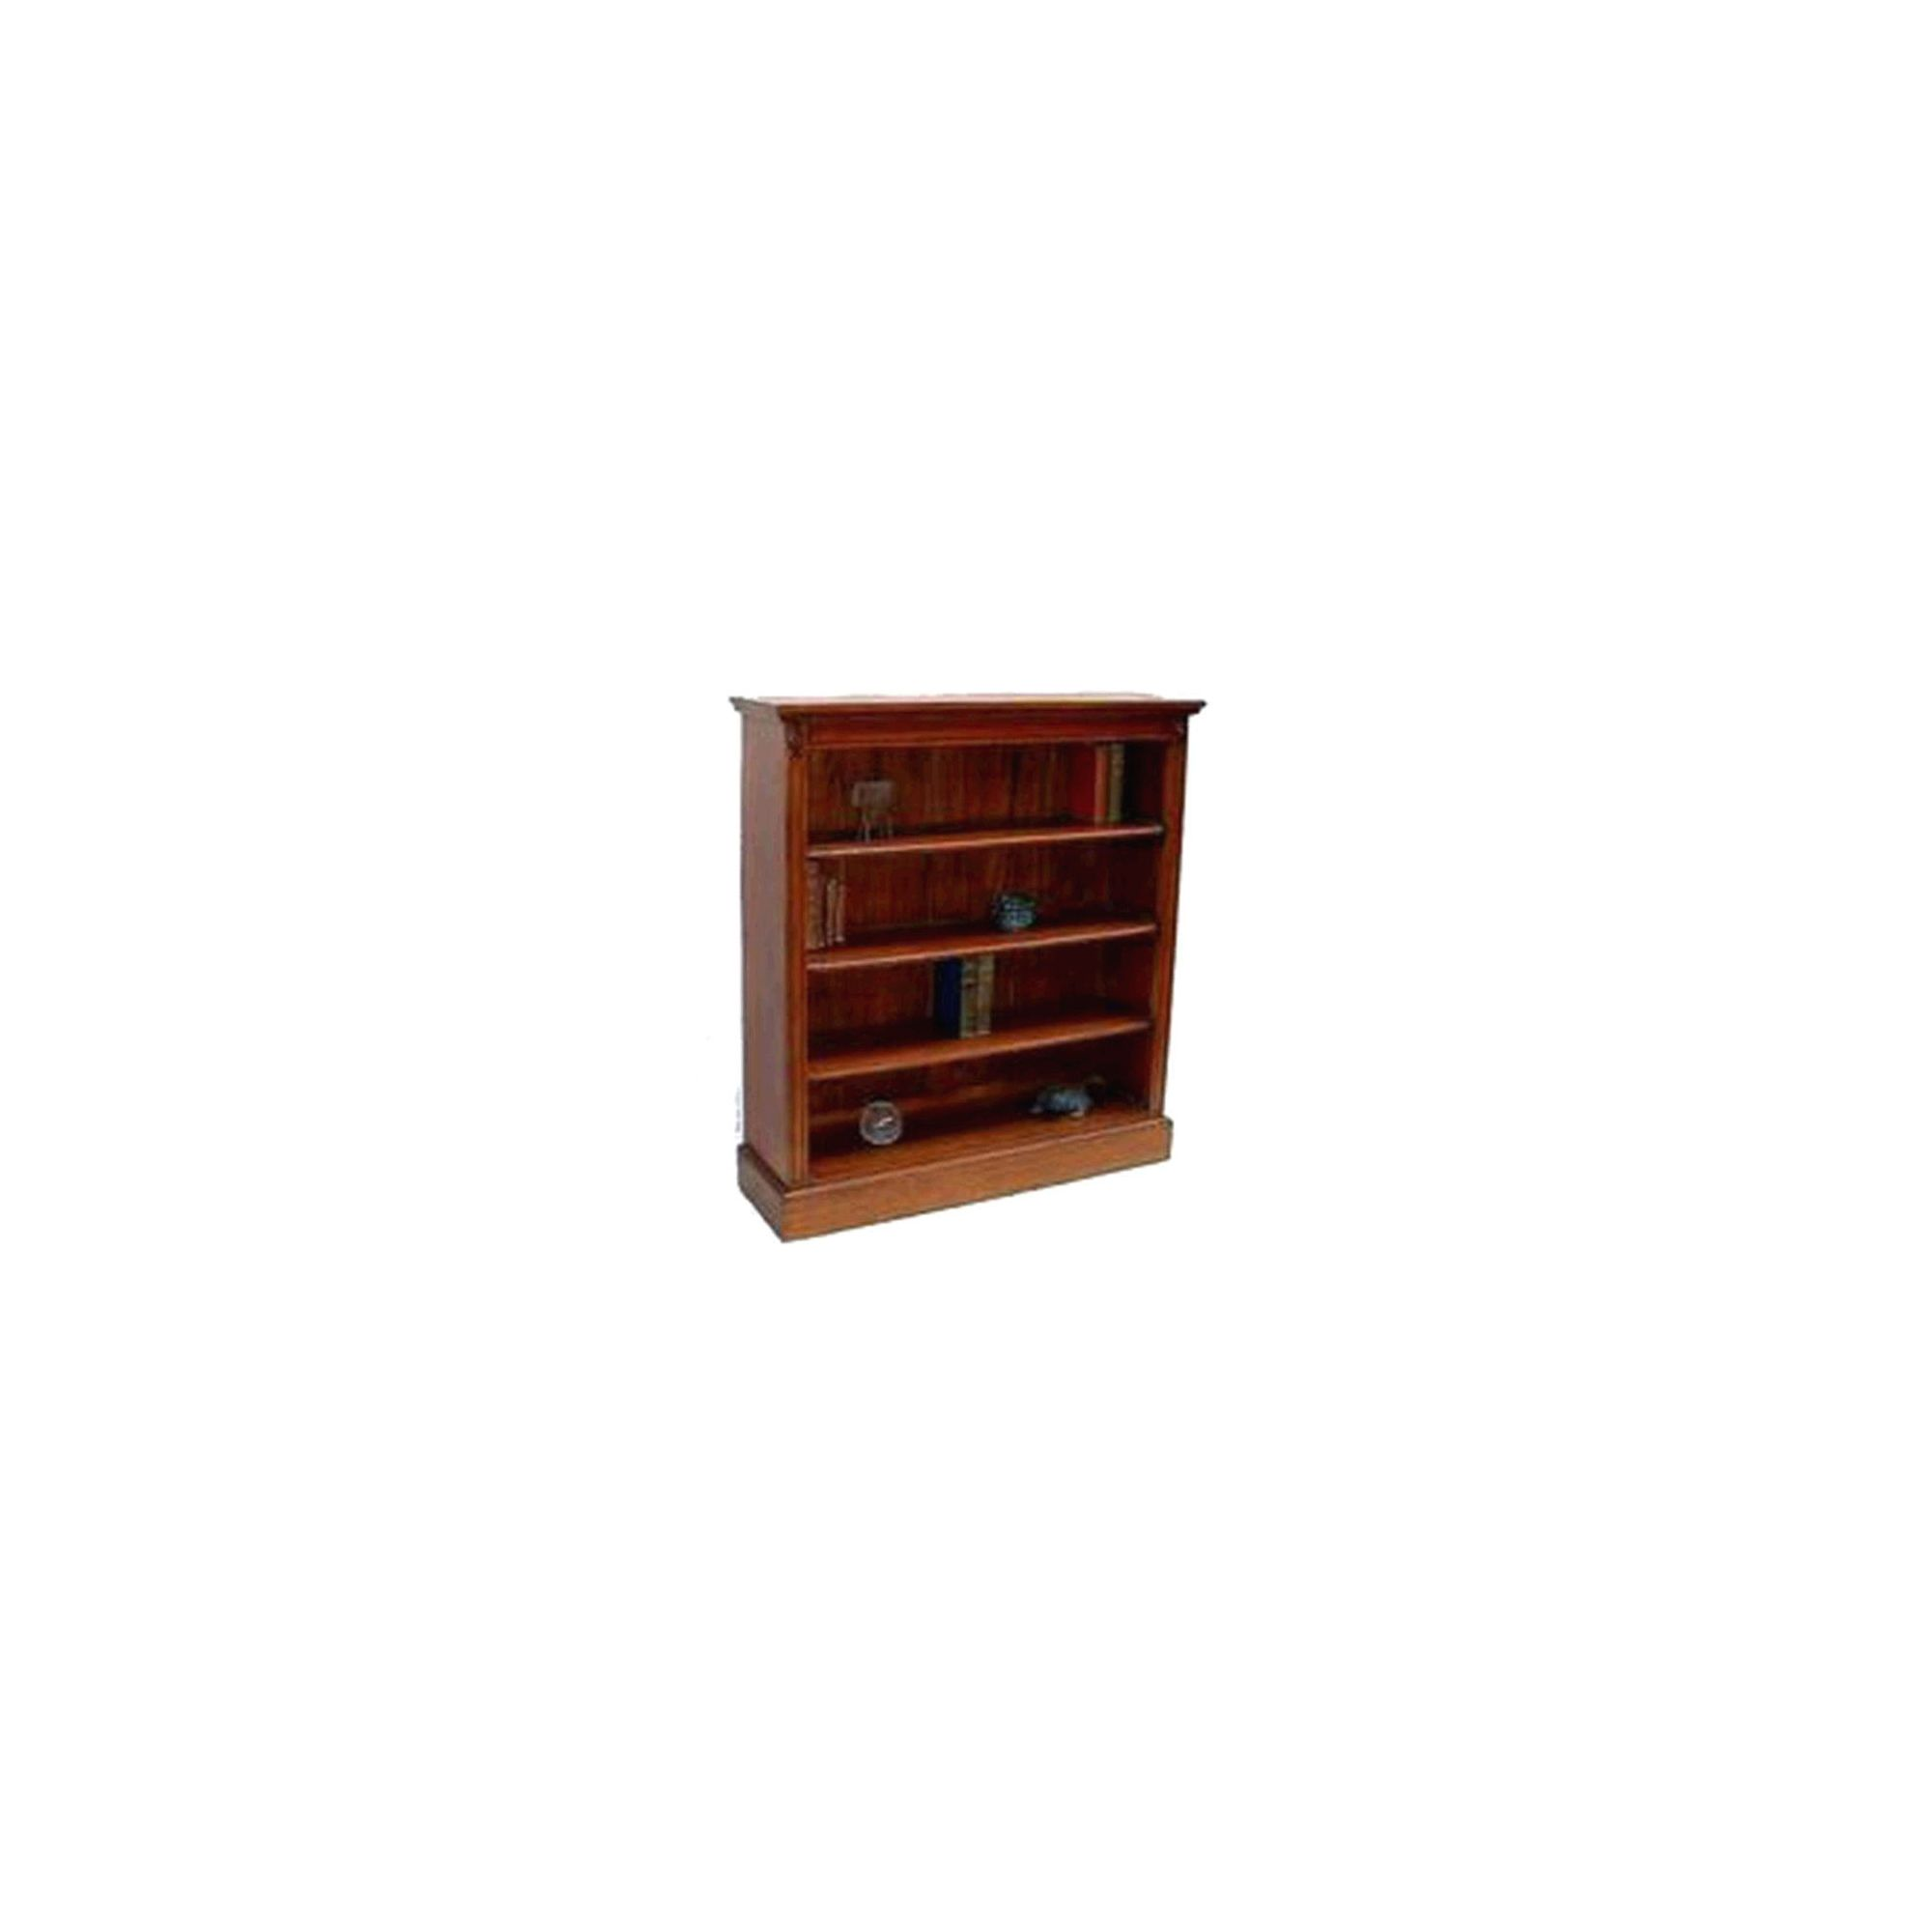 Lock stock and barrel Mahogany Low Wide 3 Shelf Bookcase in Mahogany at Tesco Direct